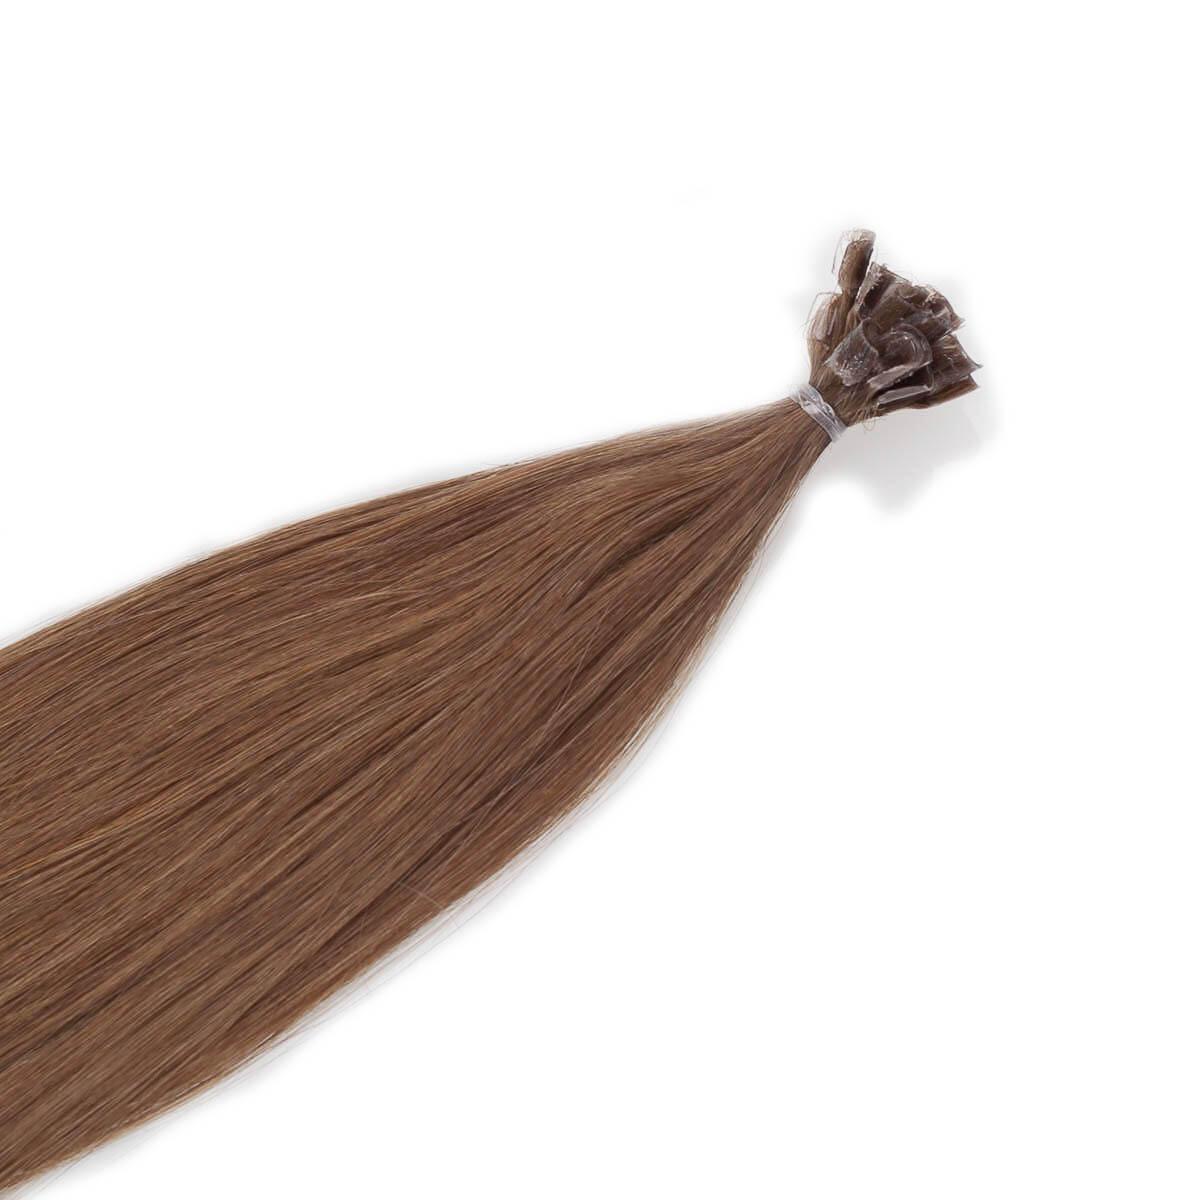 Nail Hair Original 5.1 Medium Ash Brown 30 cm